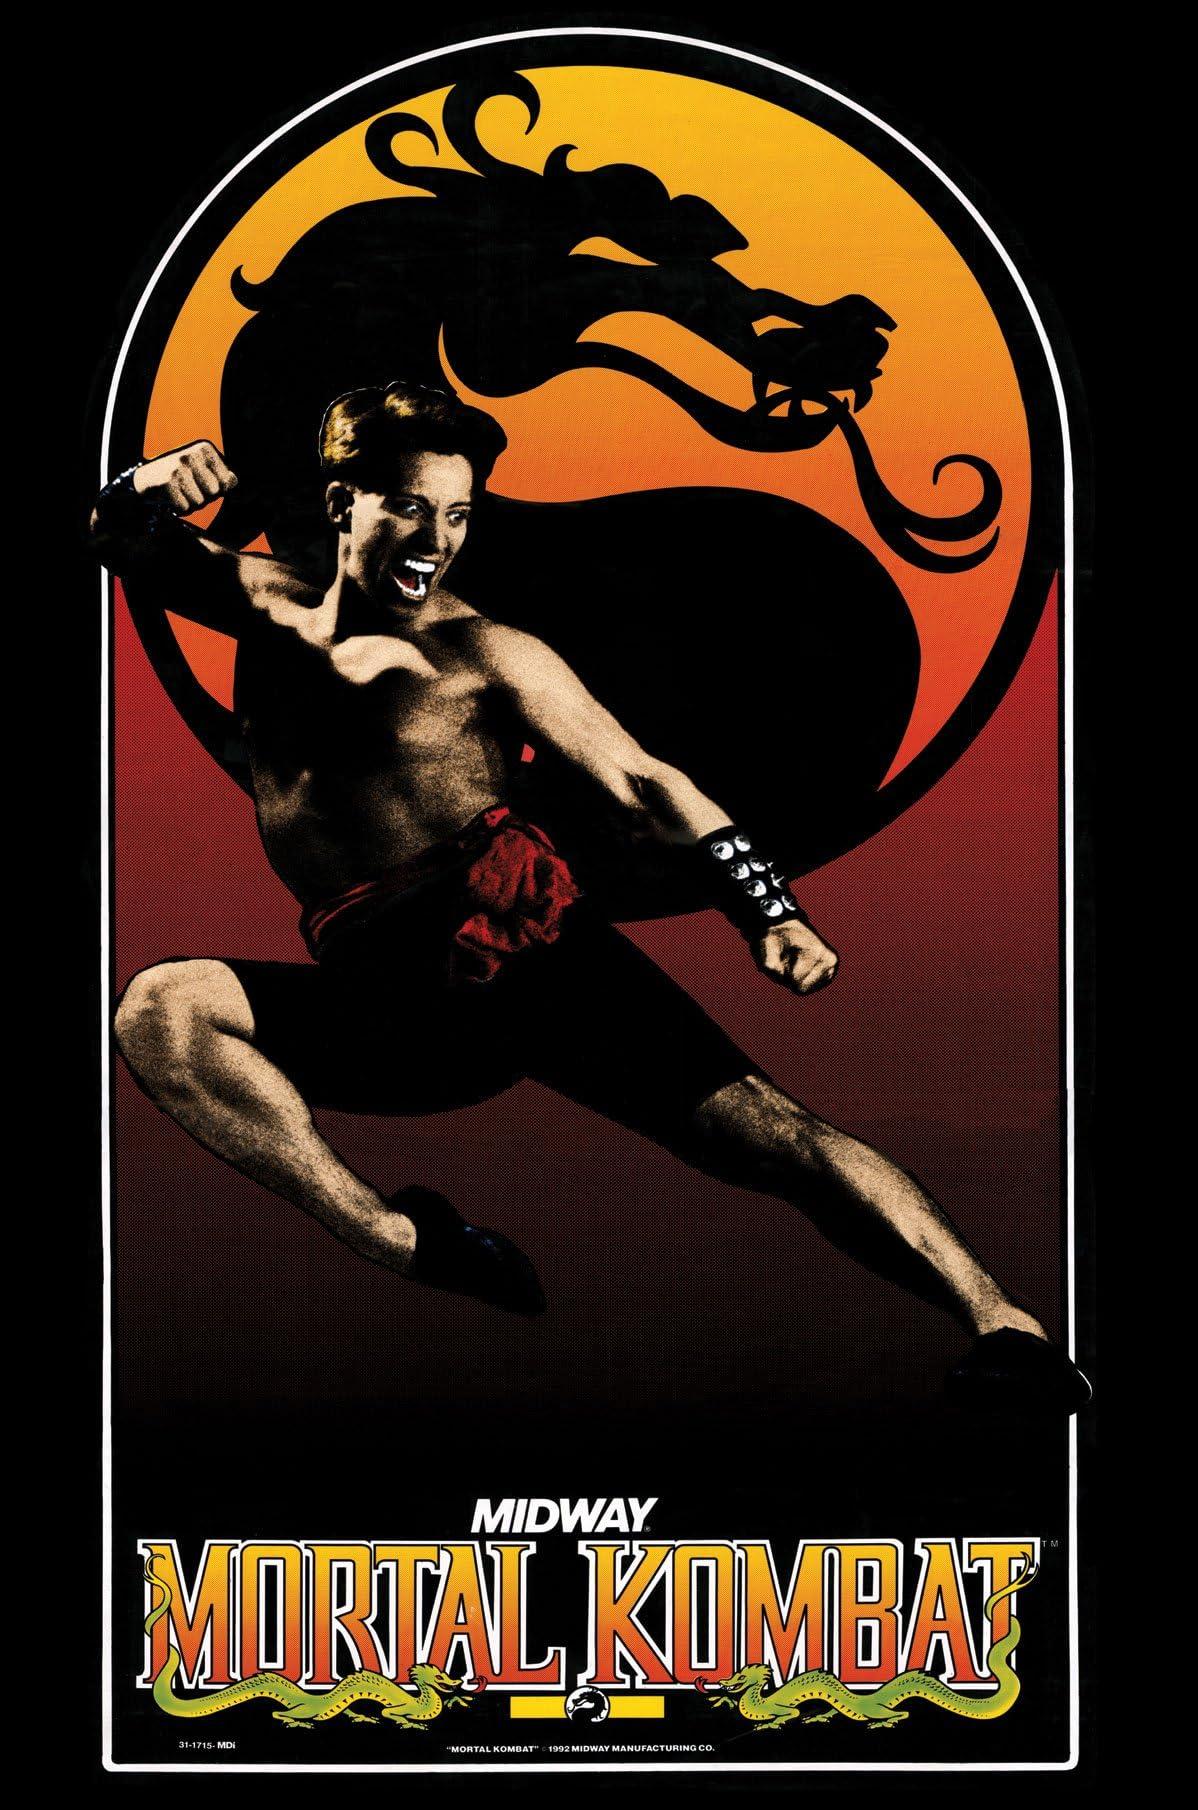 Amazon com: Mortal Kombat I or MK 1 Video Arcade Game Poster